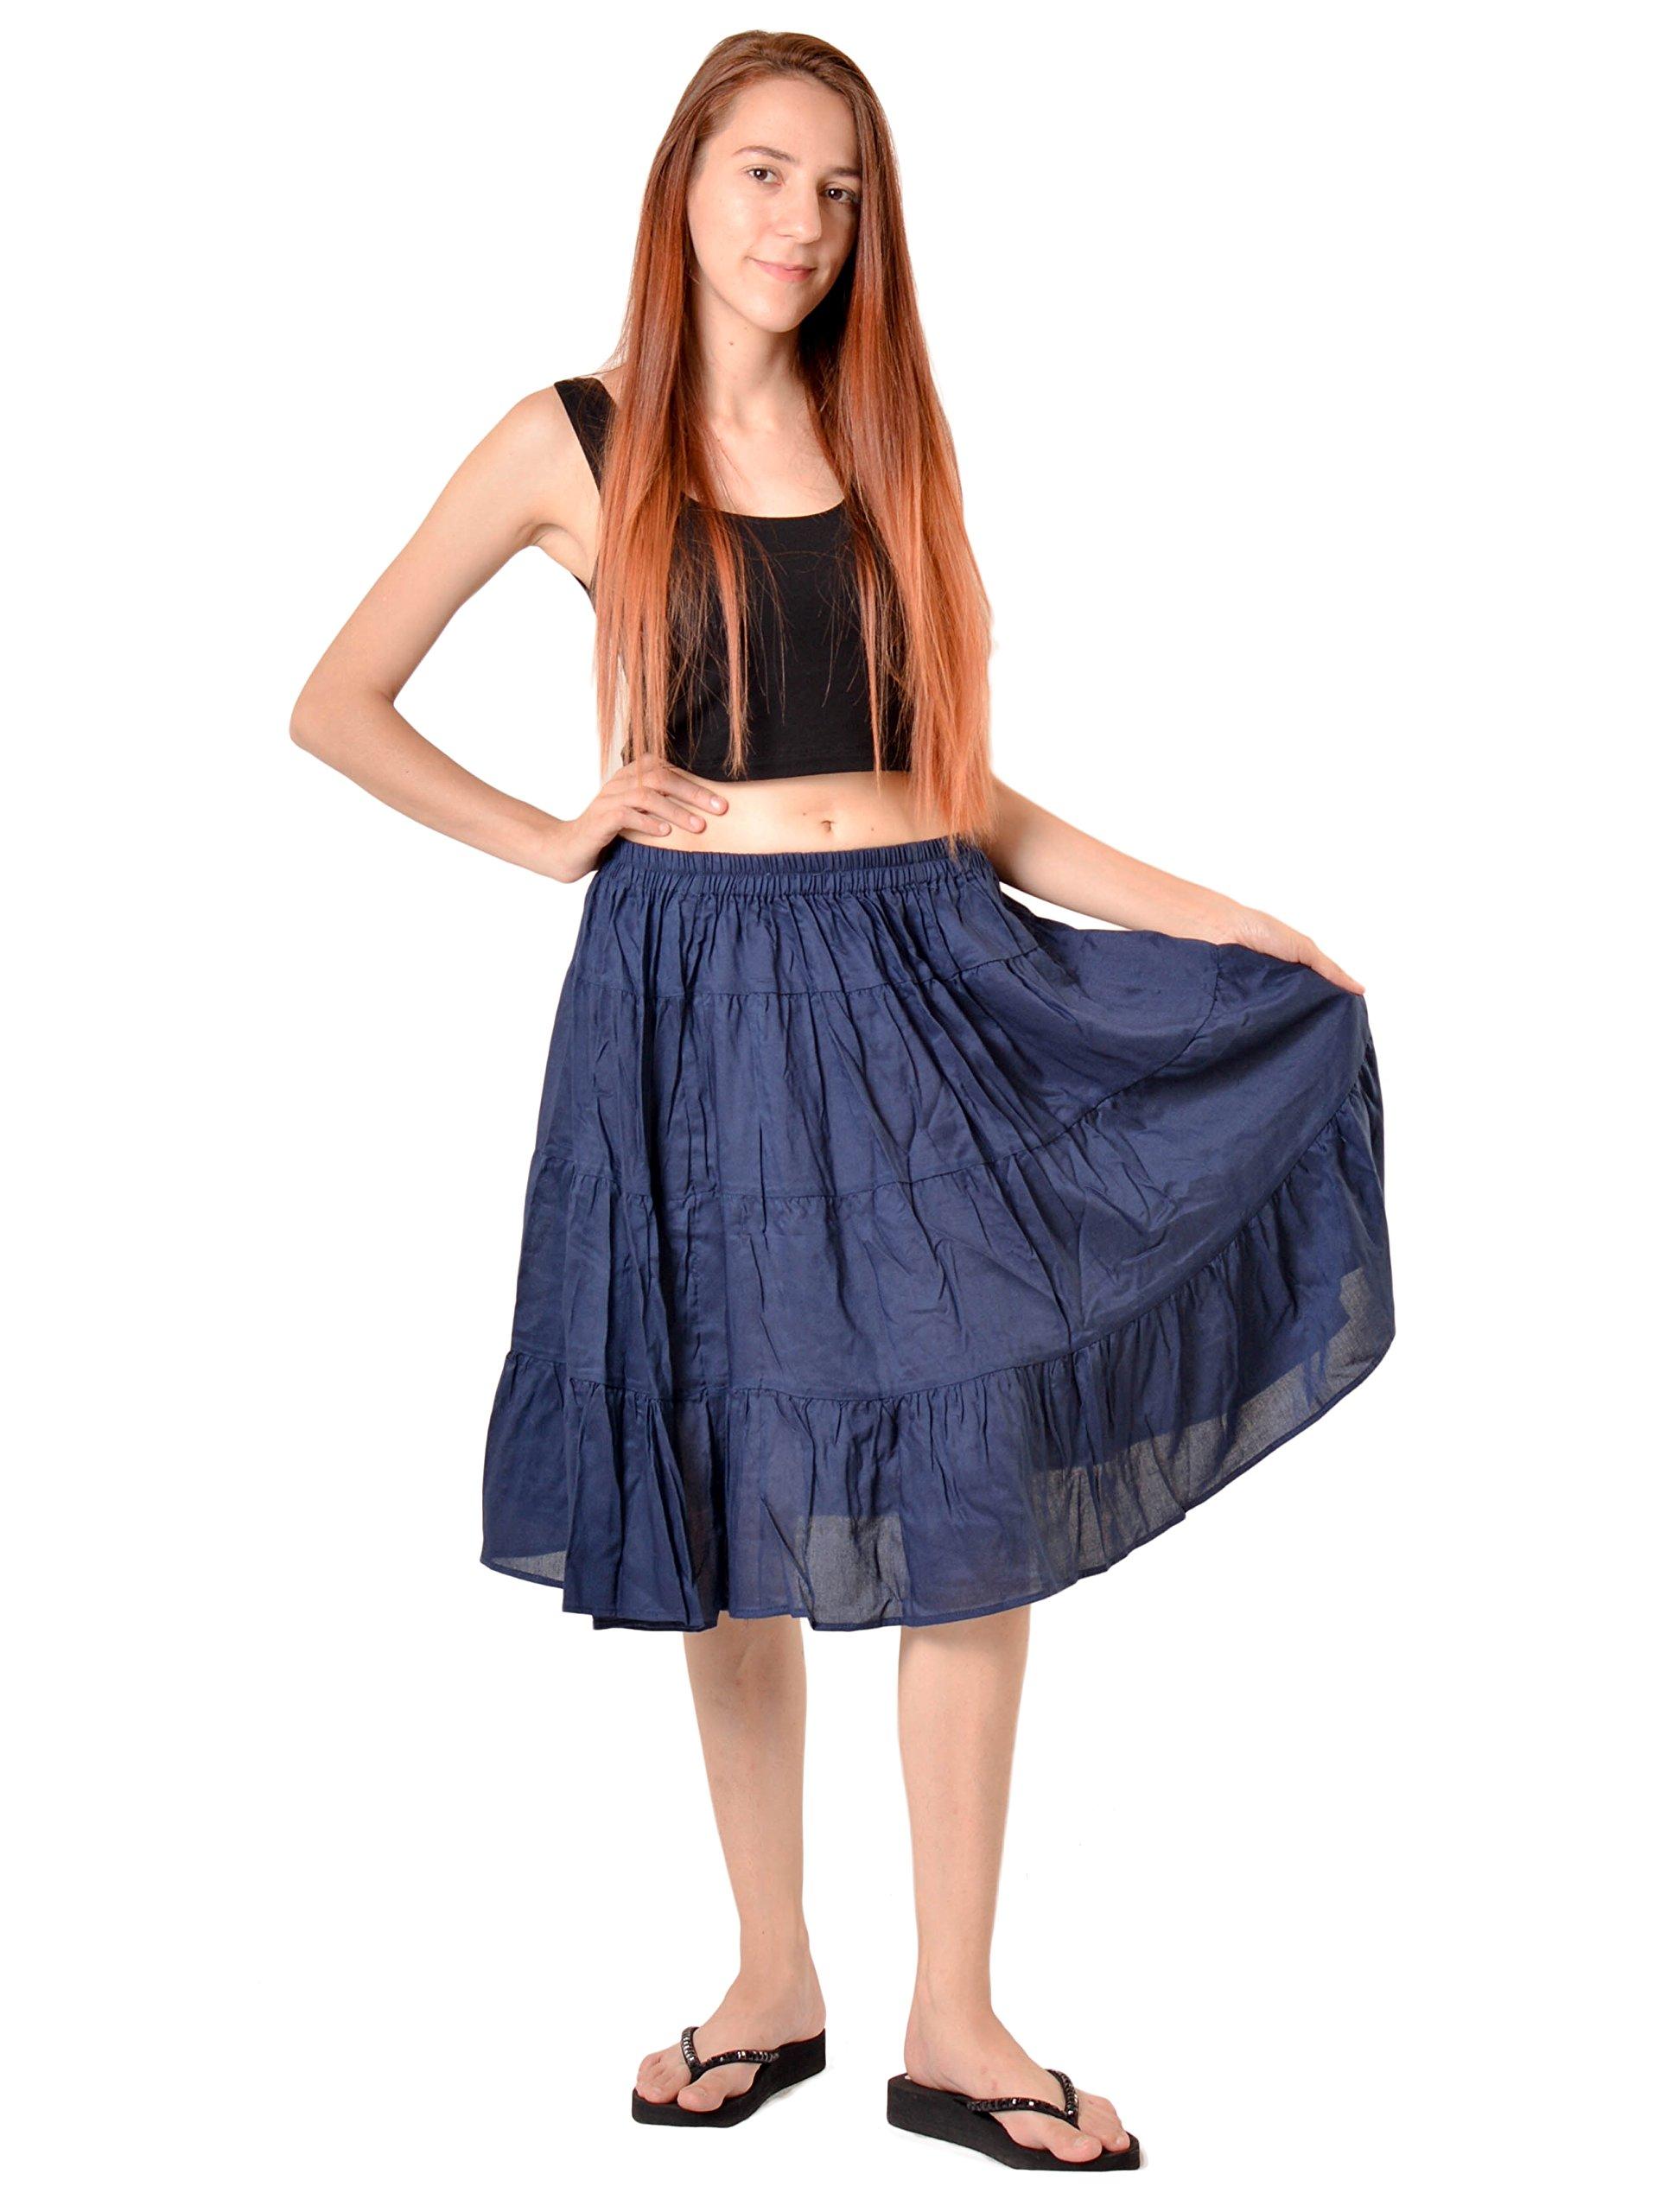 Orient Trail Women's Hippie Bohemian Boho Knee Length Skirt Medium Dark Blue